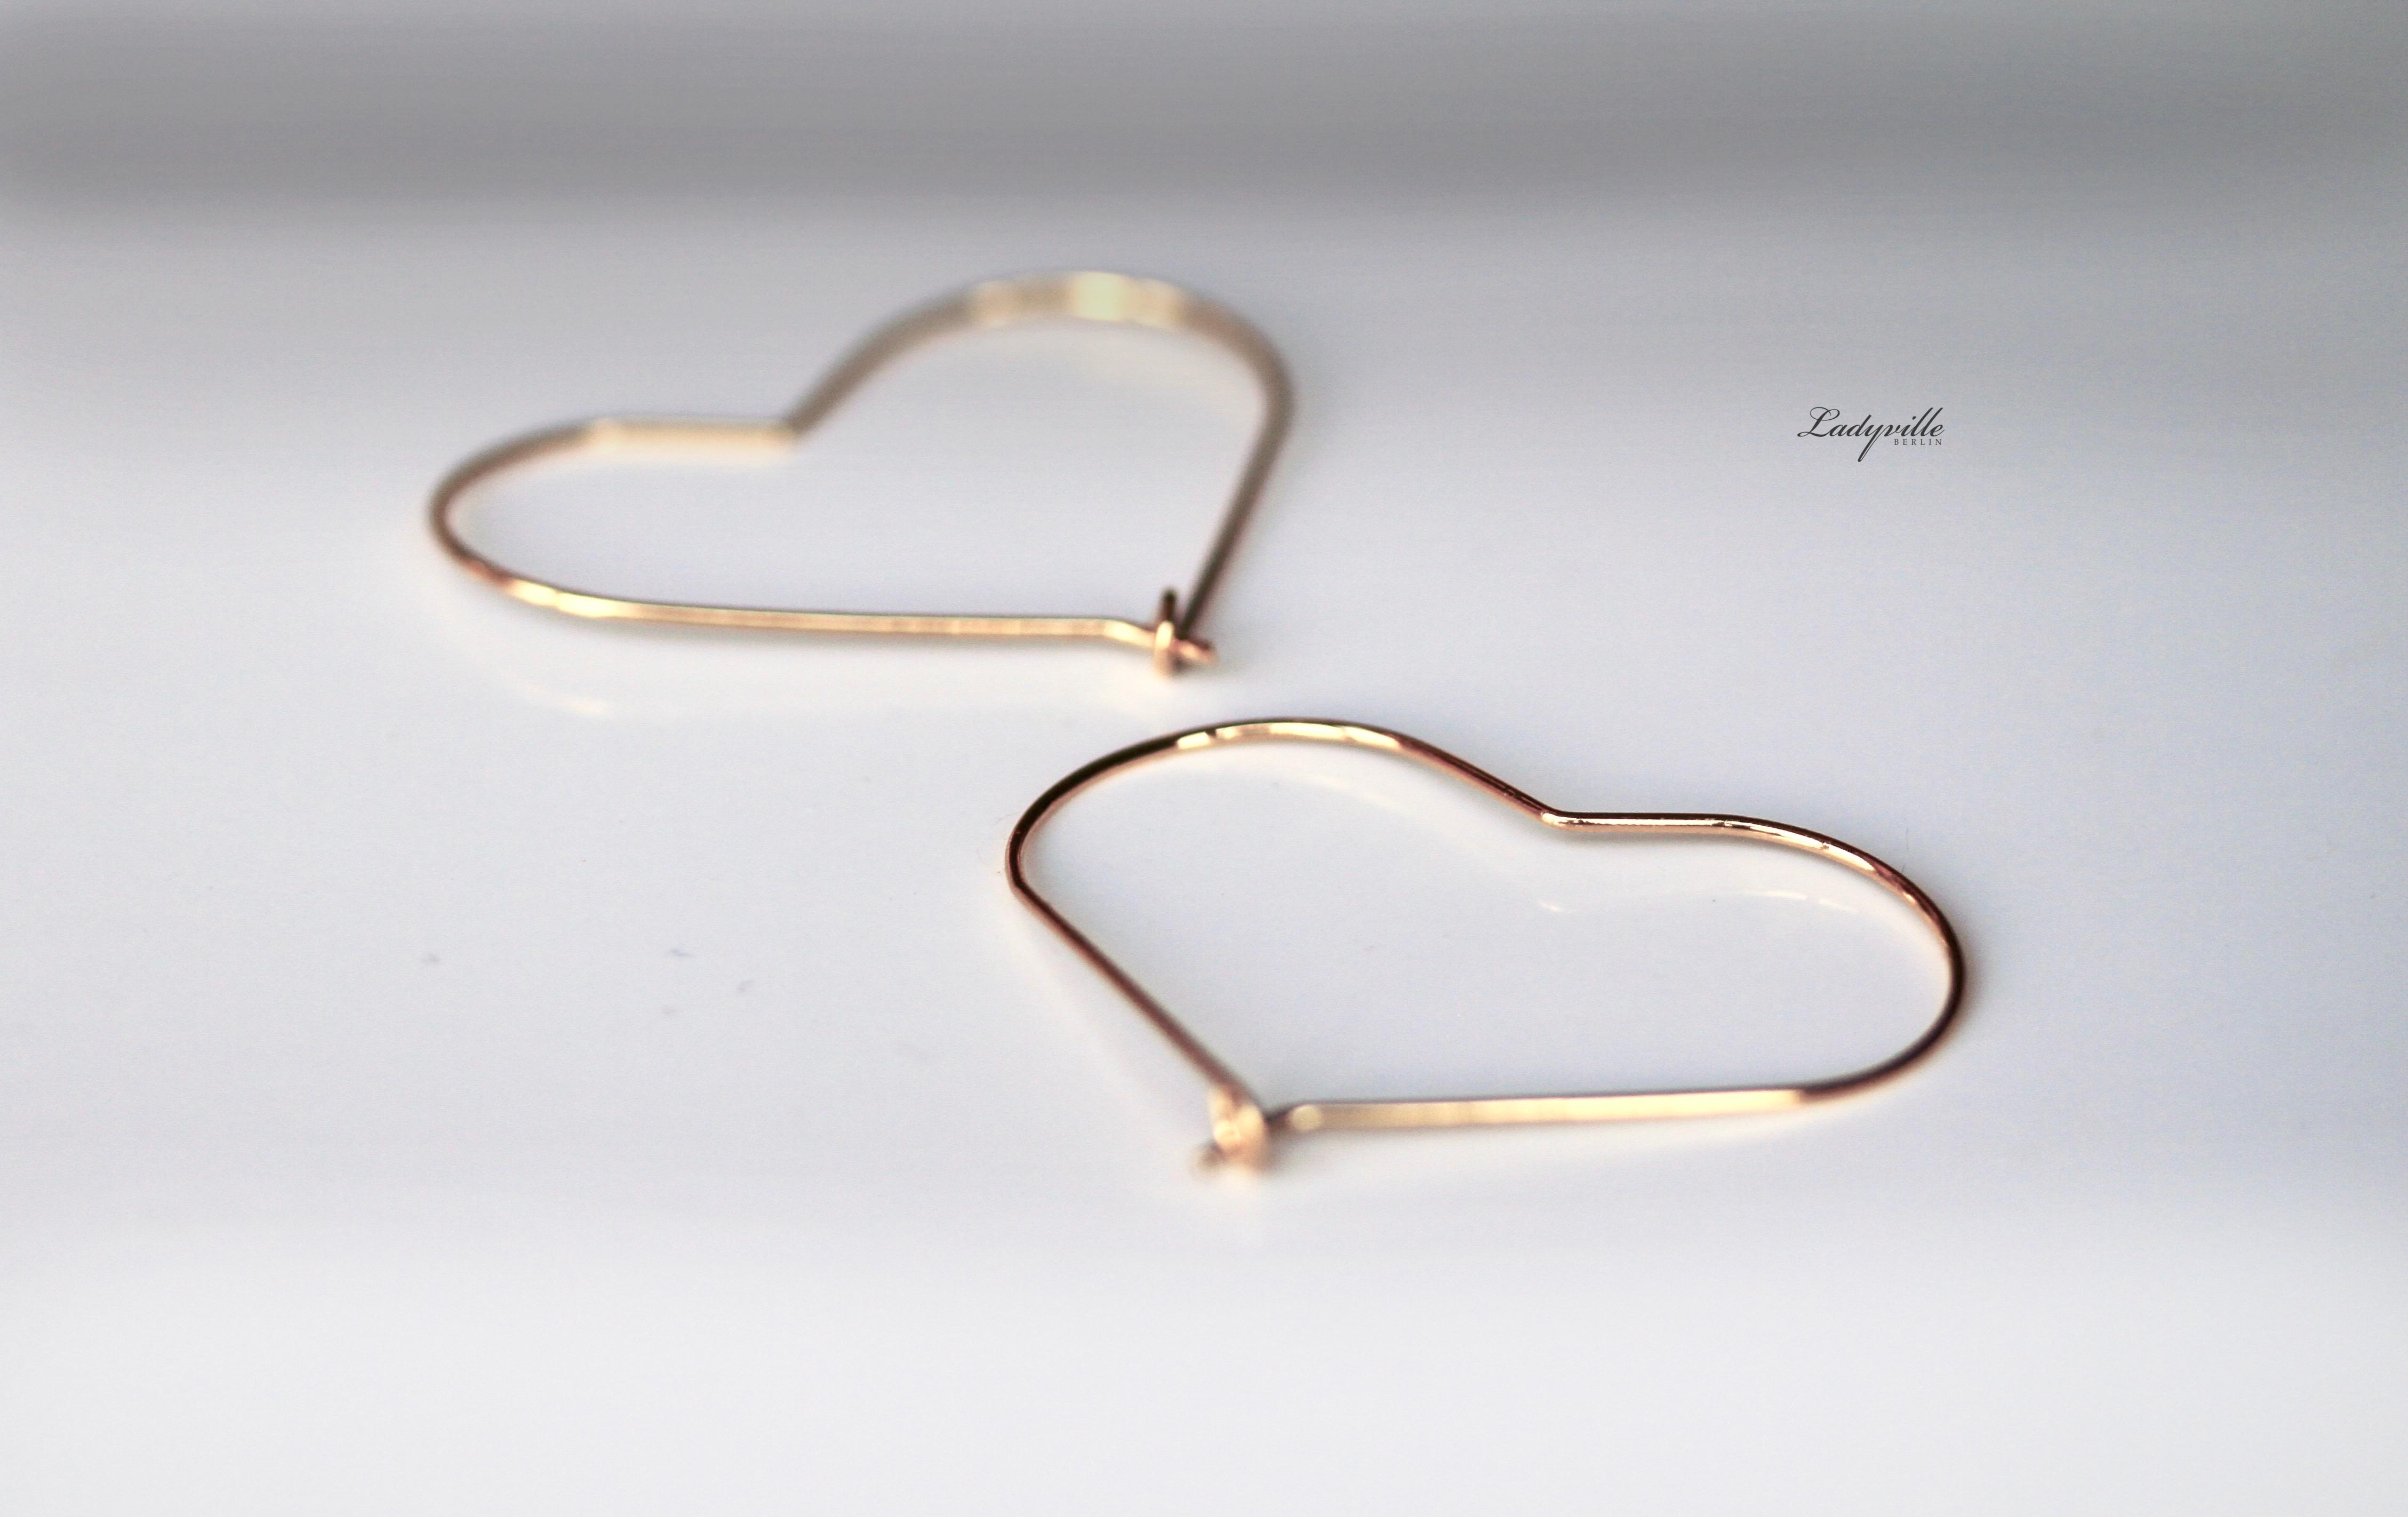 Ladyville Vergoldete Ohrringe Herz Creolen Geschenk Fur Sie